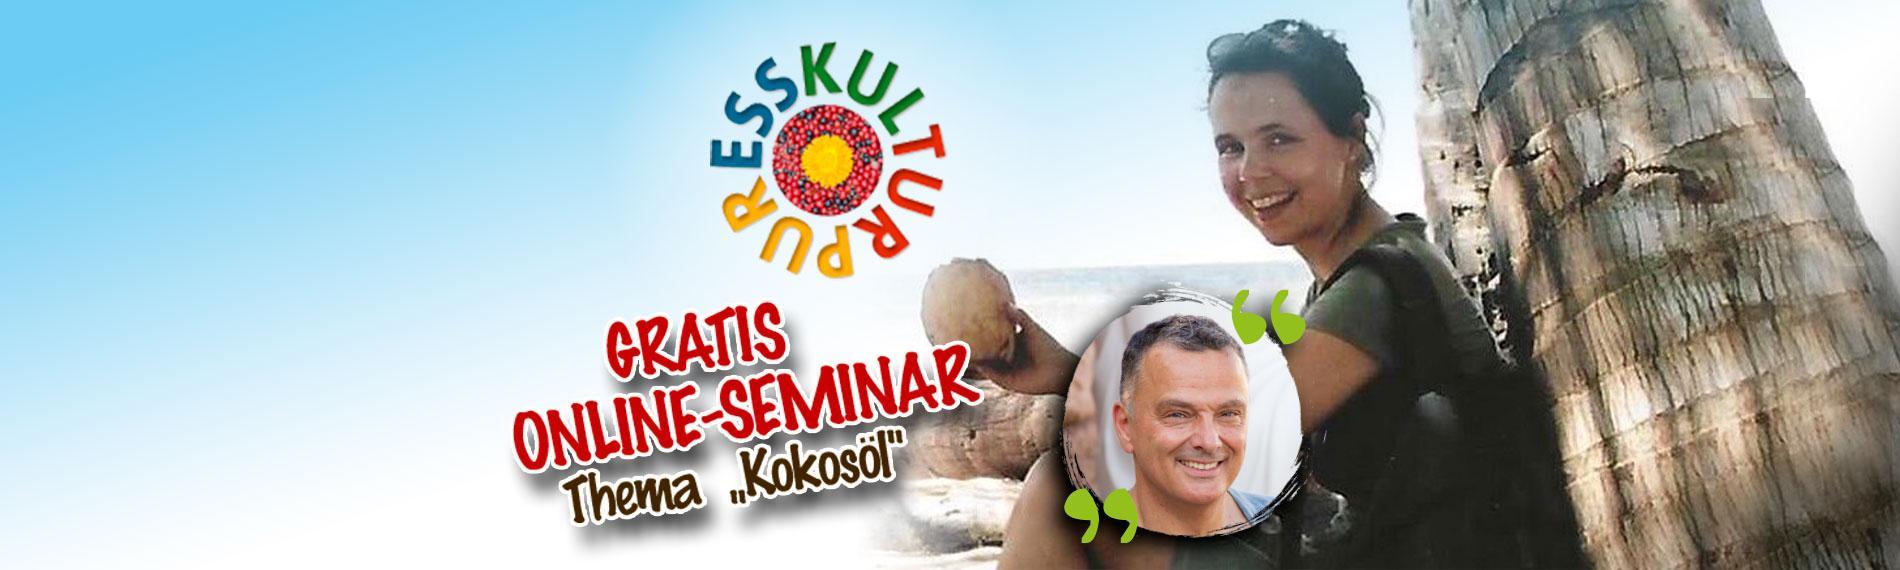 Kokosöl Online-Seminar mit Natur-Heilpraktikerin Anne Lohmann & Kokosöl-Experte Manfred Görg